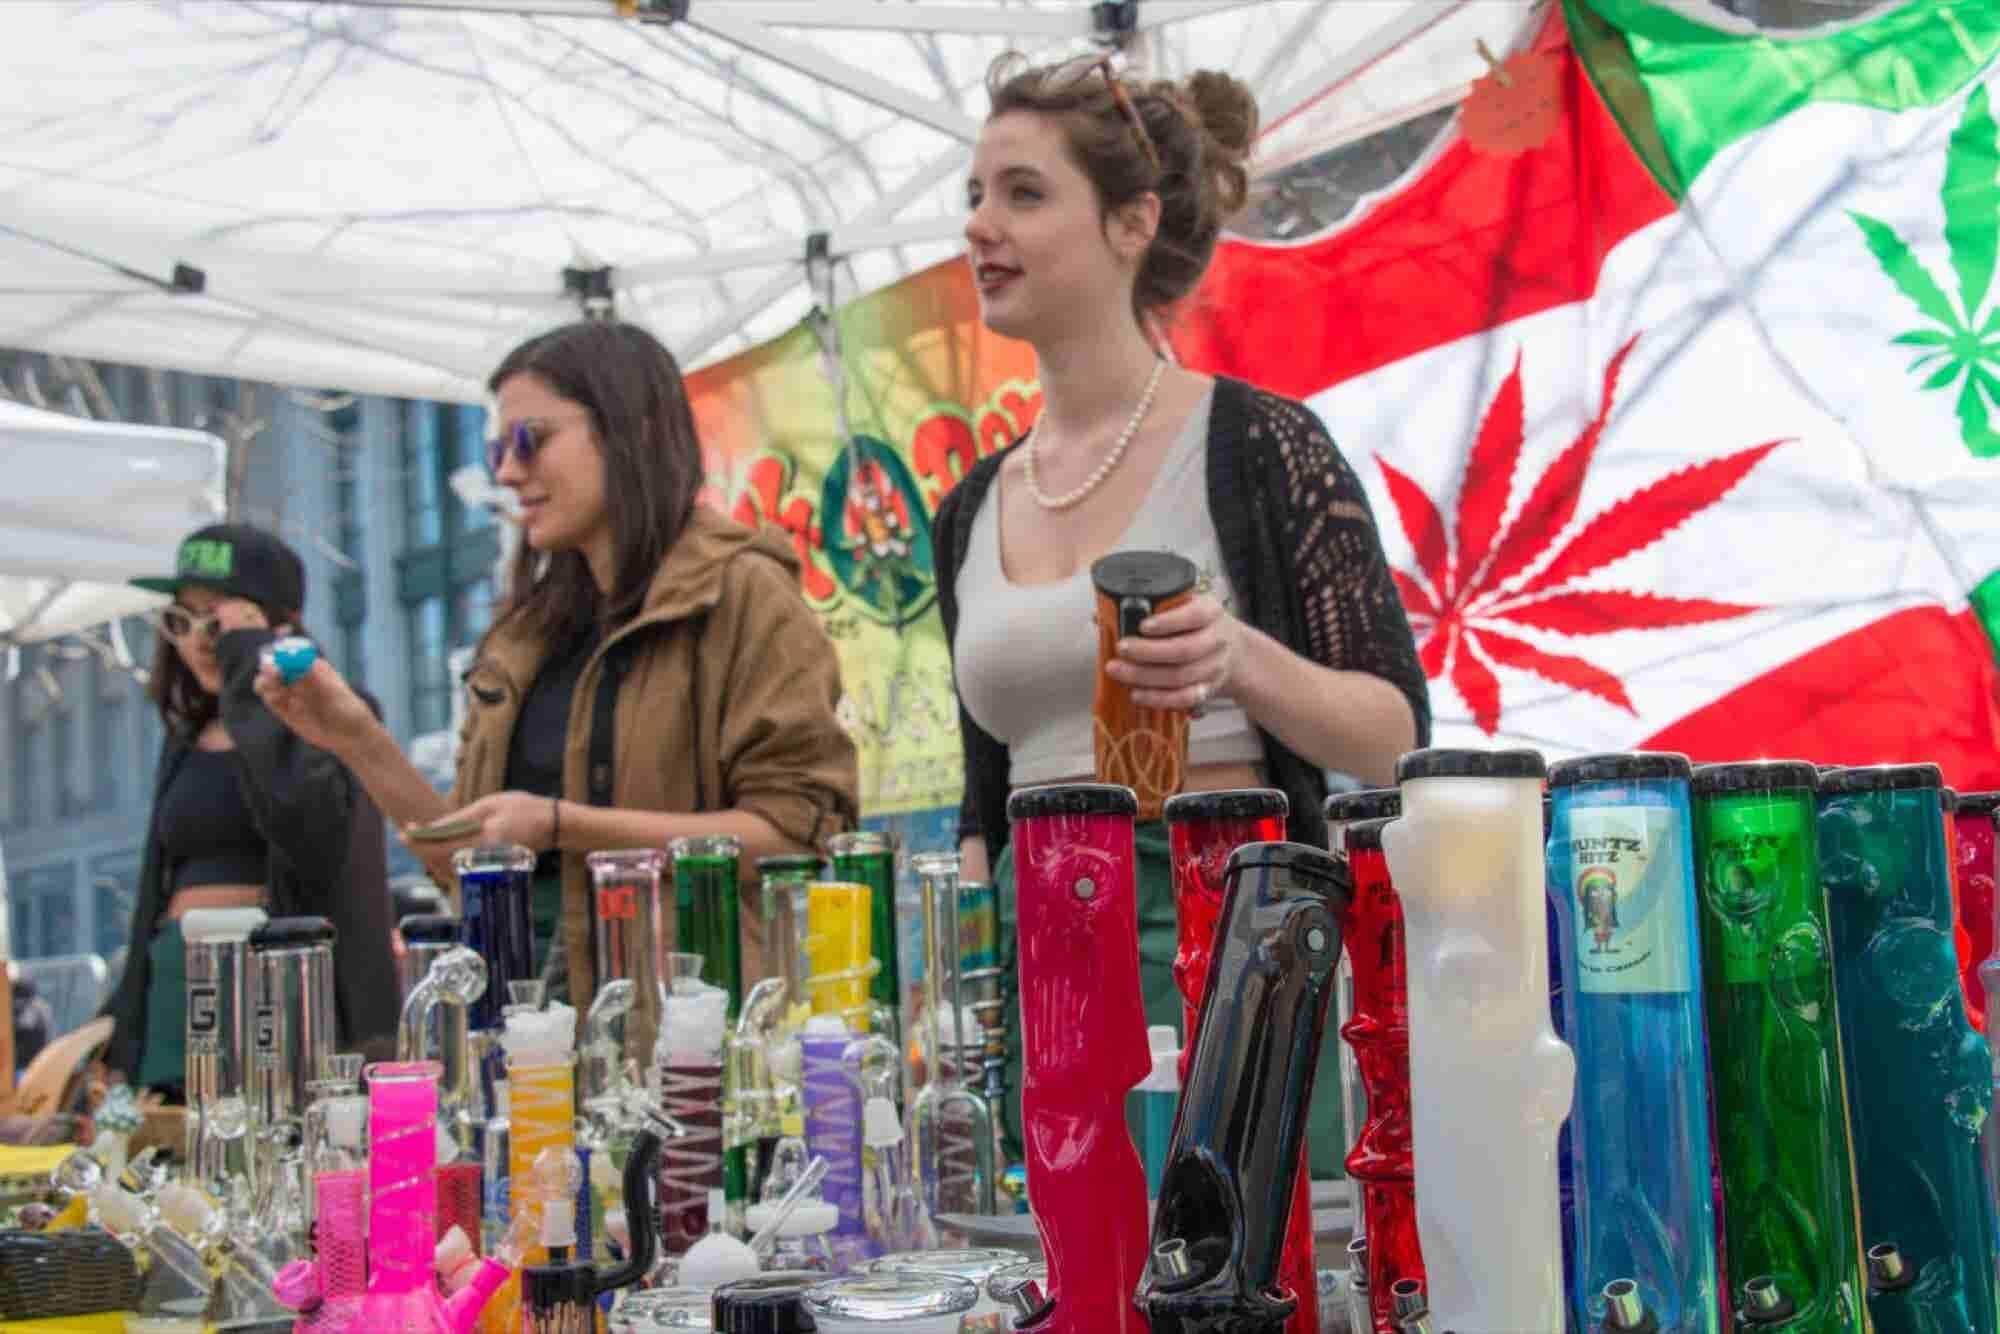 Canada Is Creating a Multi-Billion Dollar Legal Marijuana Industry